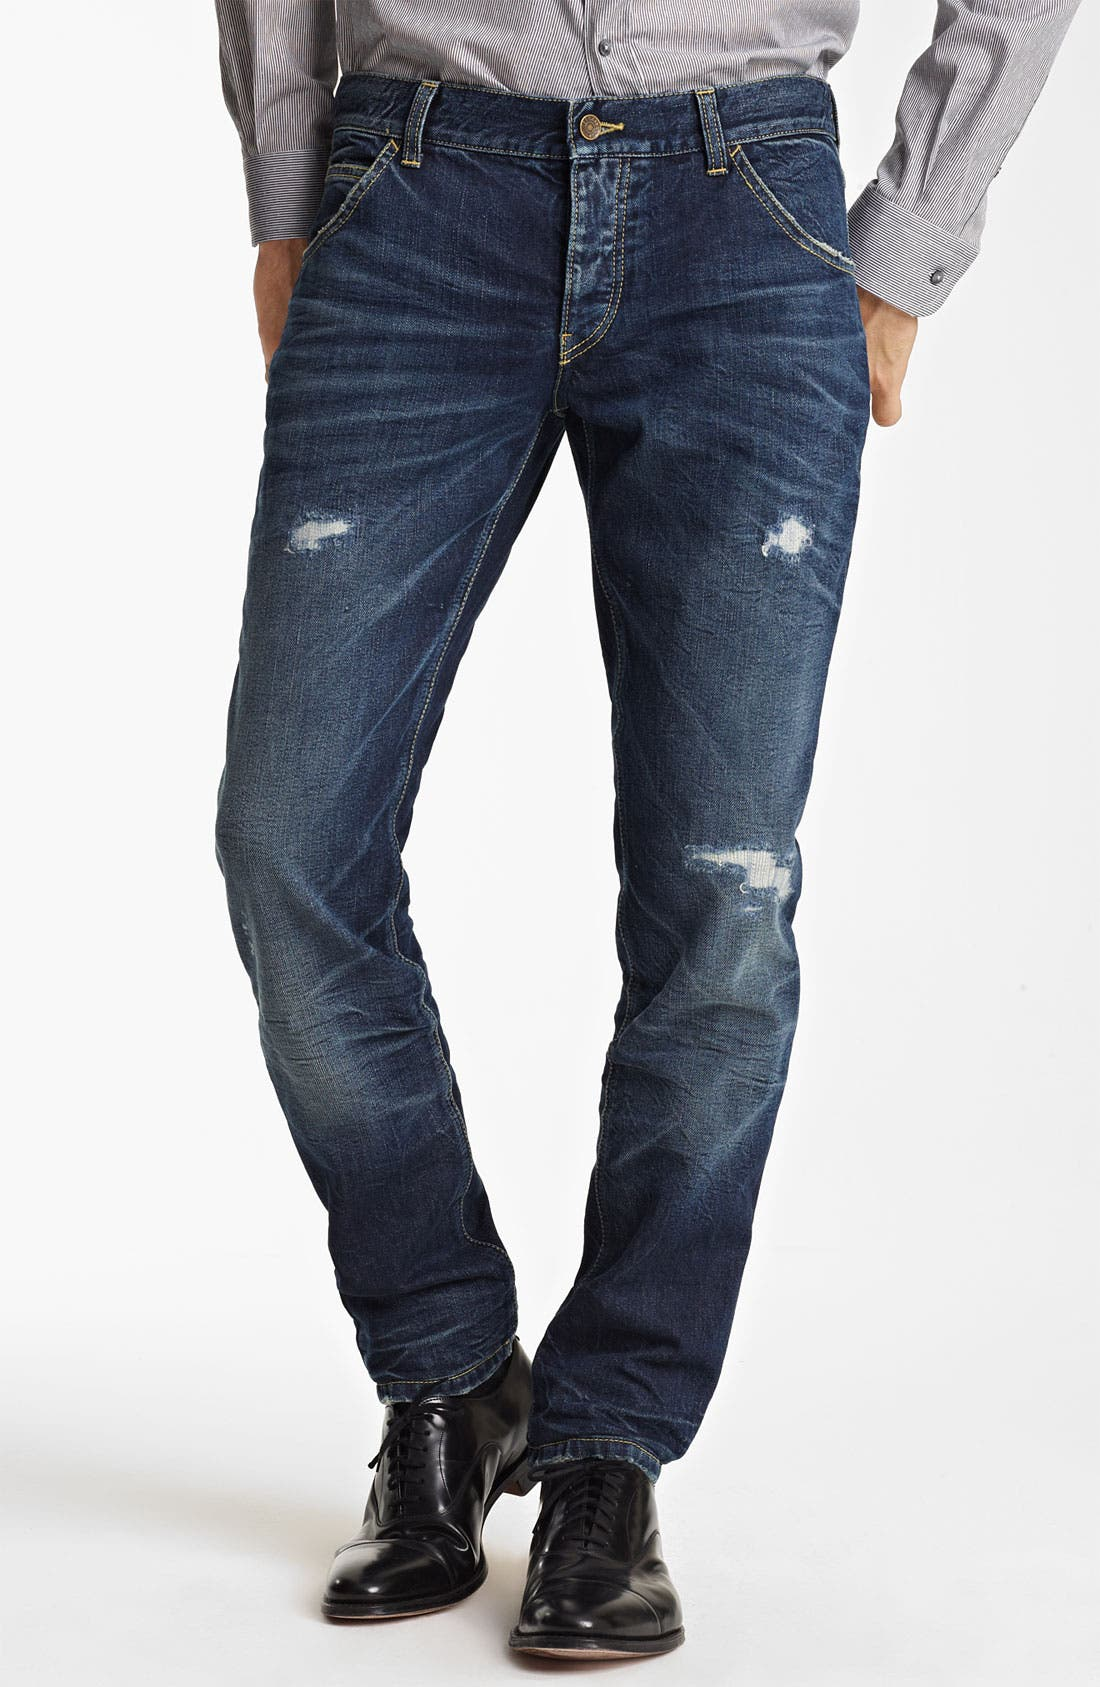 Alternate Image 1 Selected - Dolce&Gabbana Slim Fit Jeans (Dark Blue)